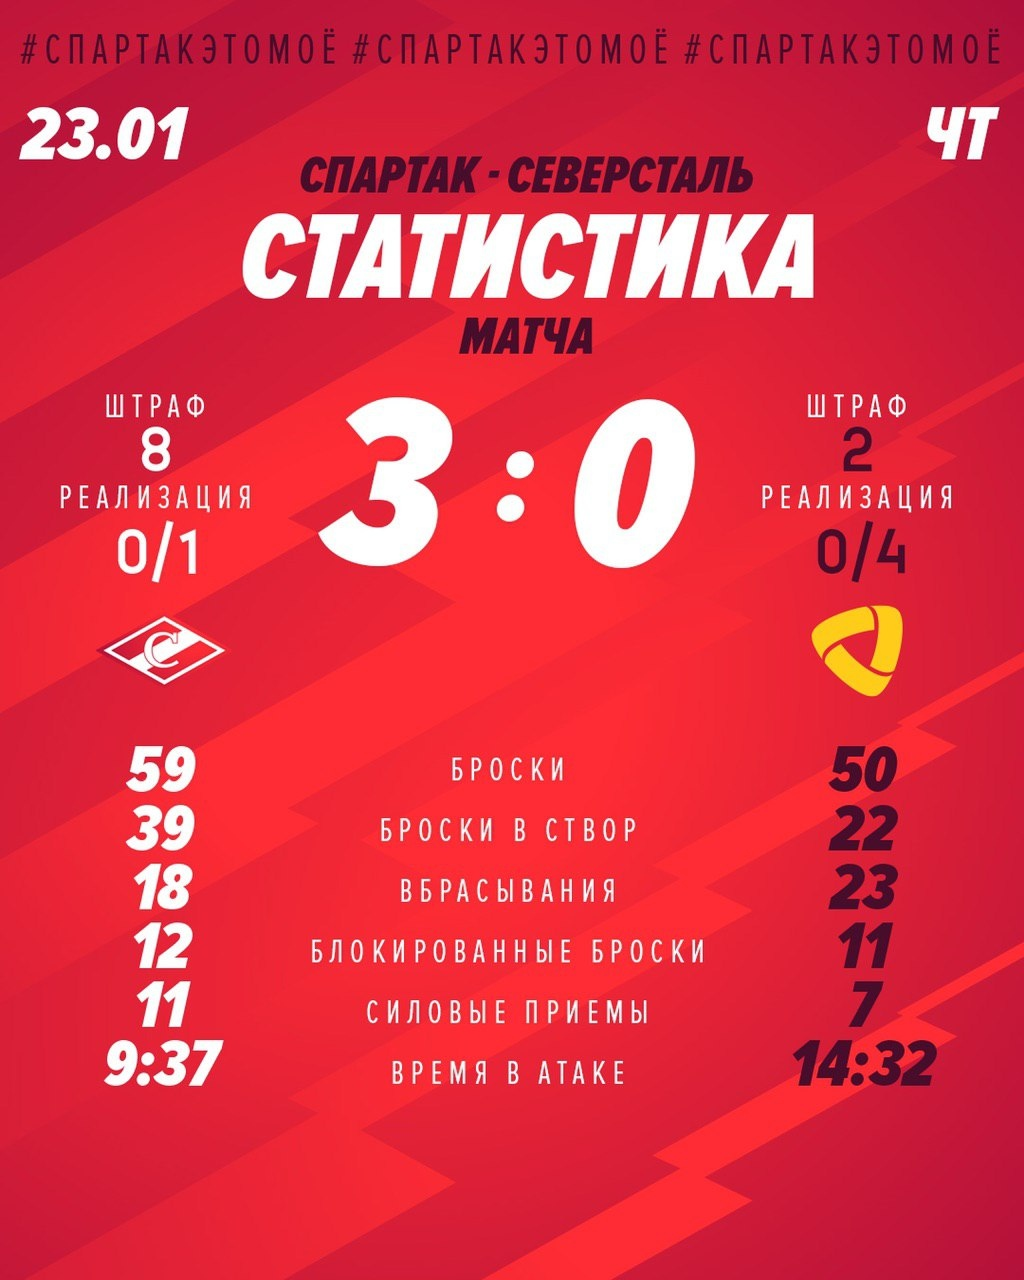 Статистика матча «Спартак» -«Северсталь» 3:0